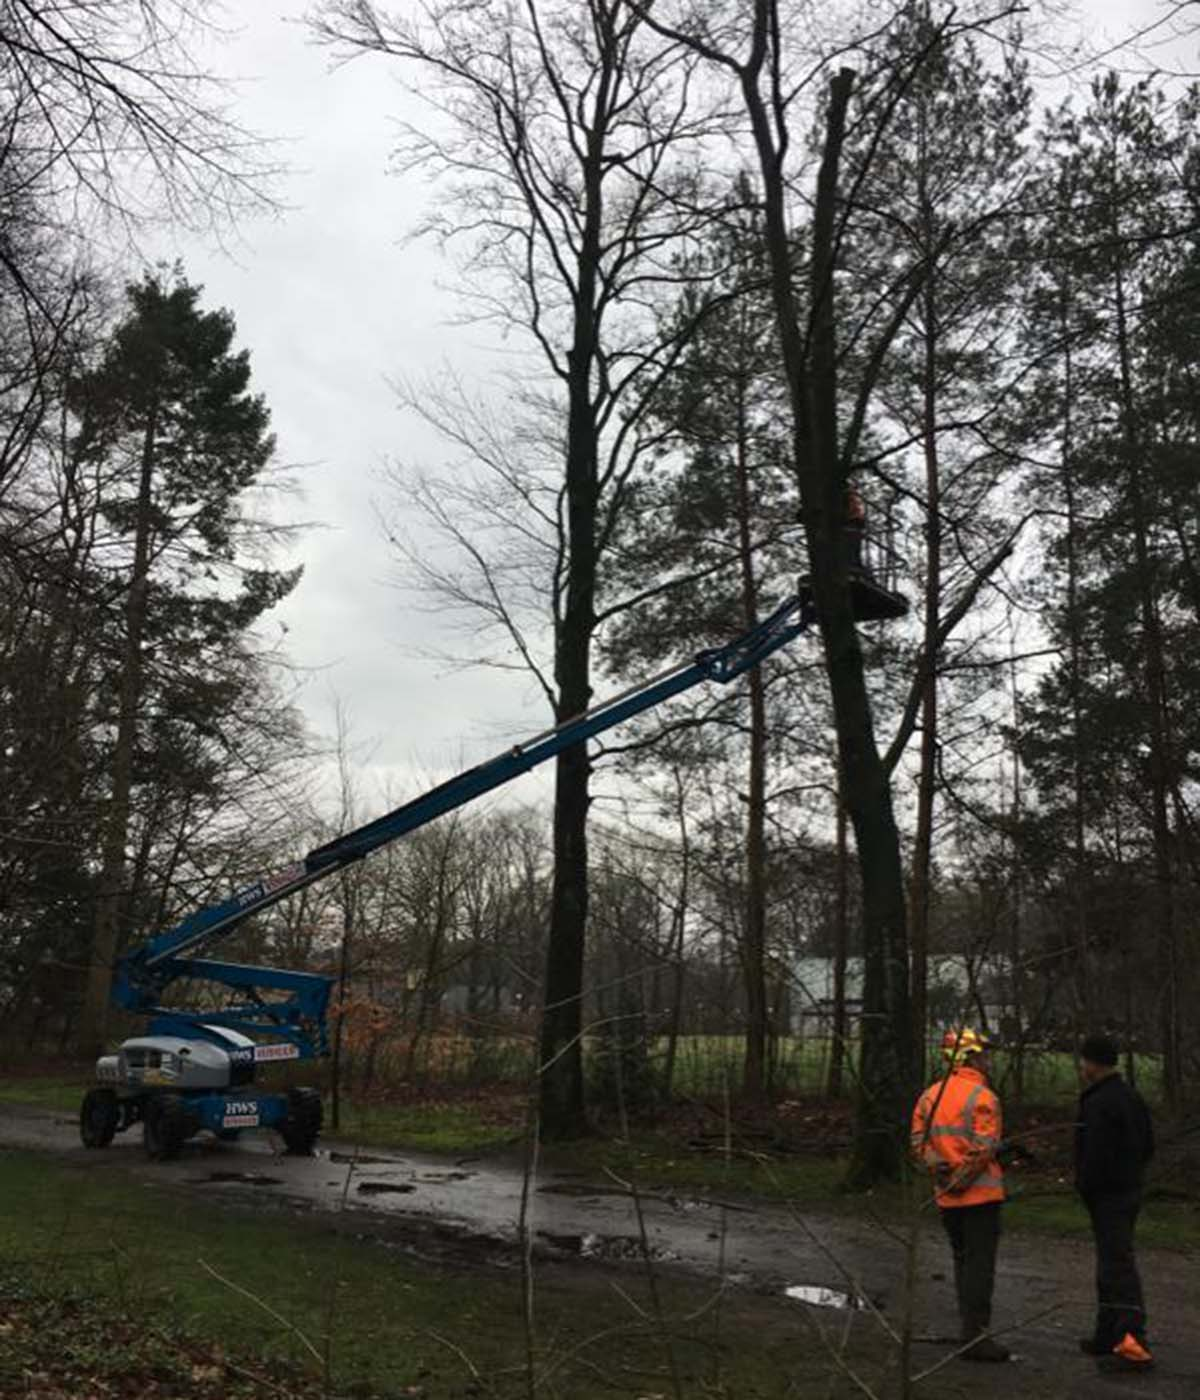 Hoefakker boomspecialisten - snoeiwerkzaamheden hoge bomen landgoed Valkenheide Maarsbergen 20-02-17 (3)